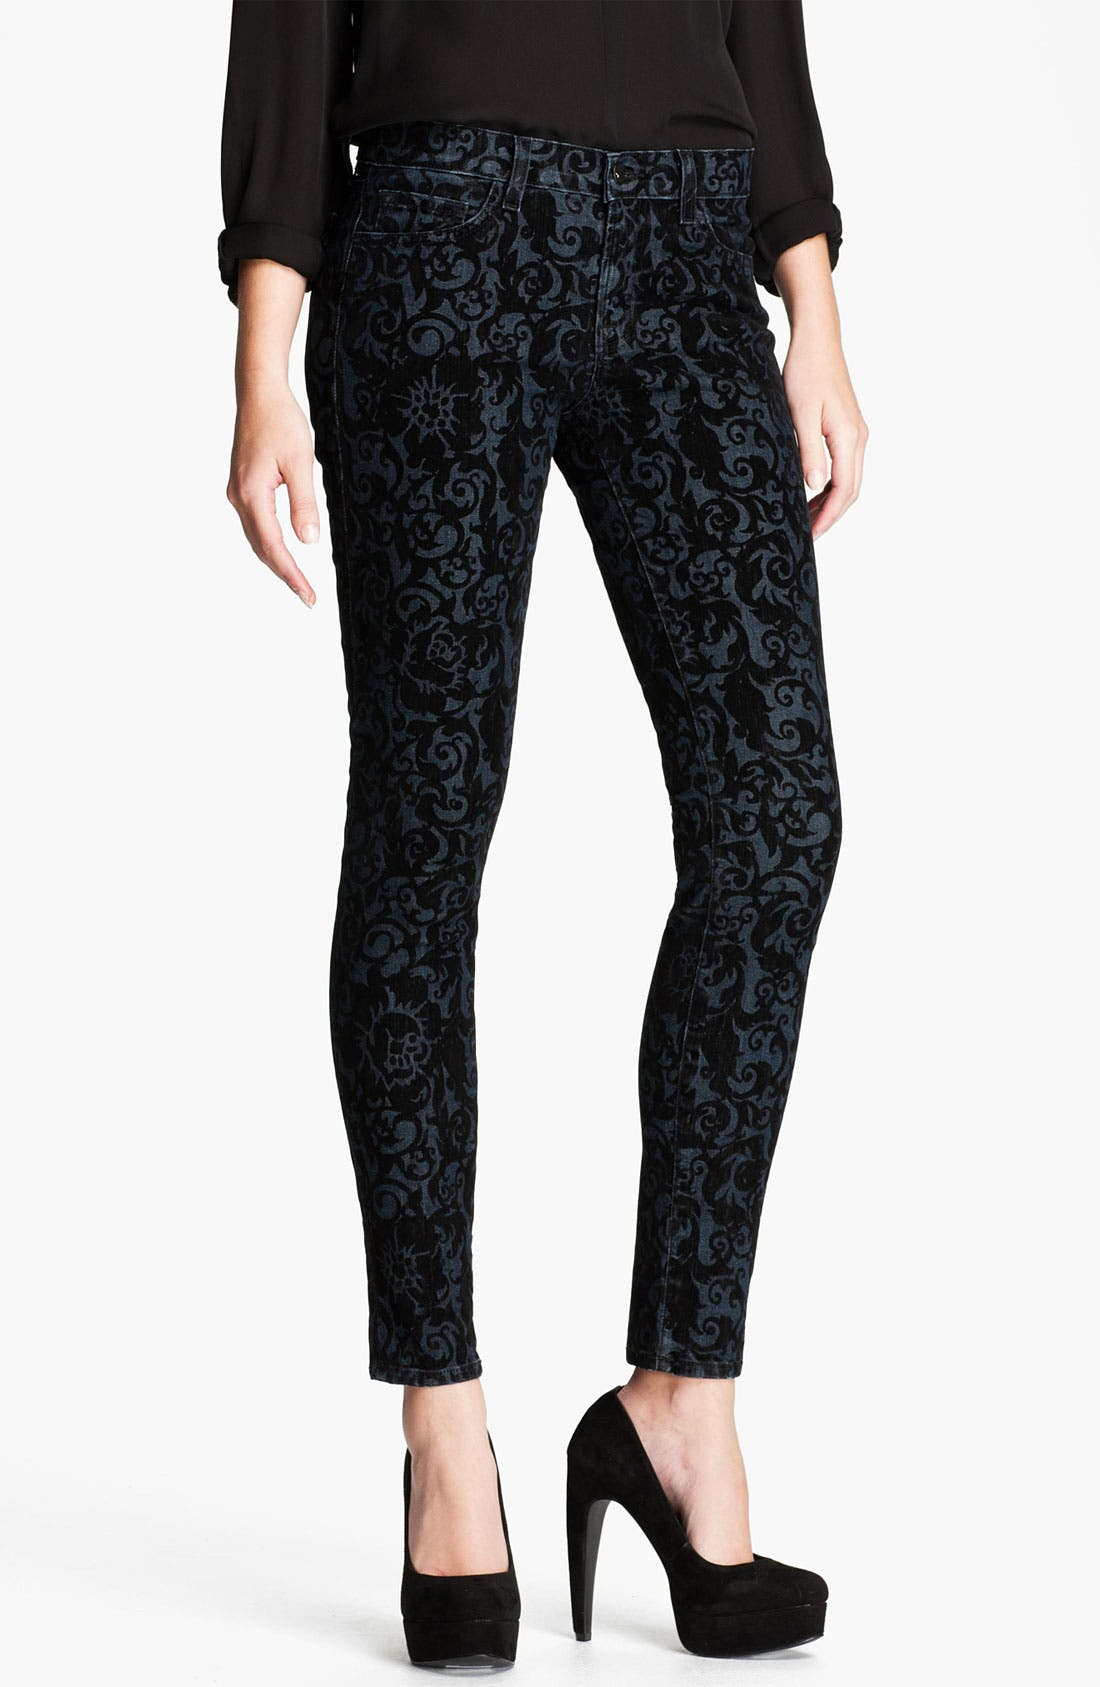 Alternate Image 1 Selected - J Brand Brocade Print Stretch Denim Skinny Jeans